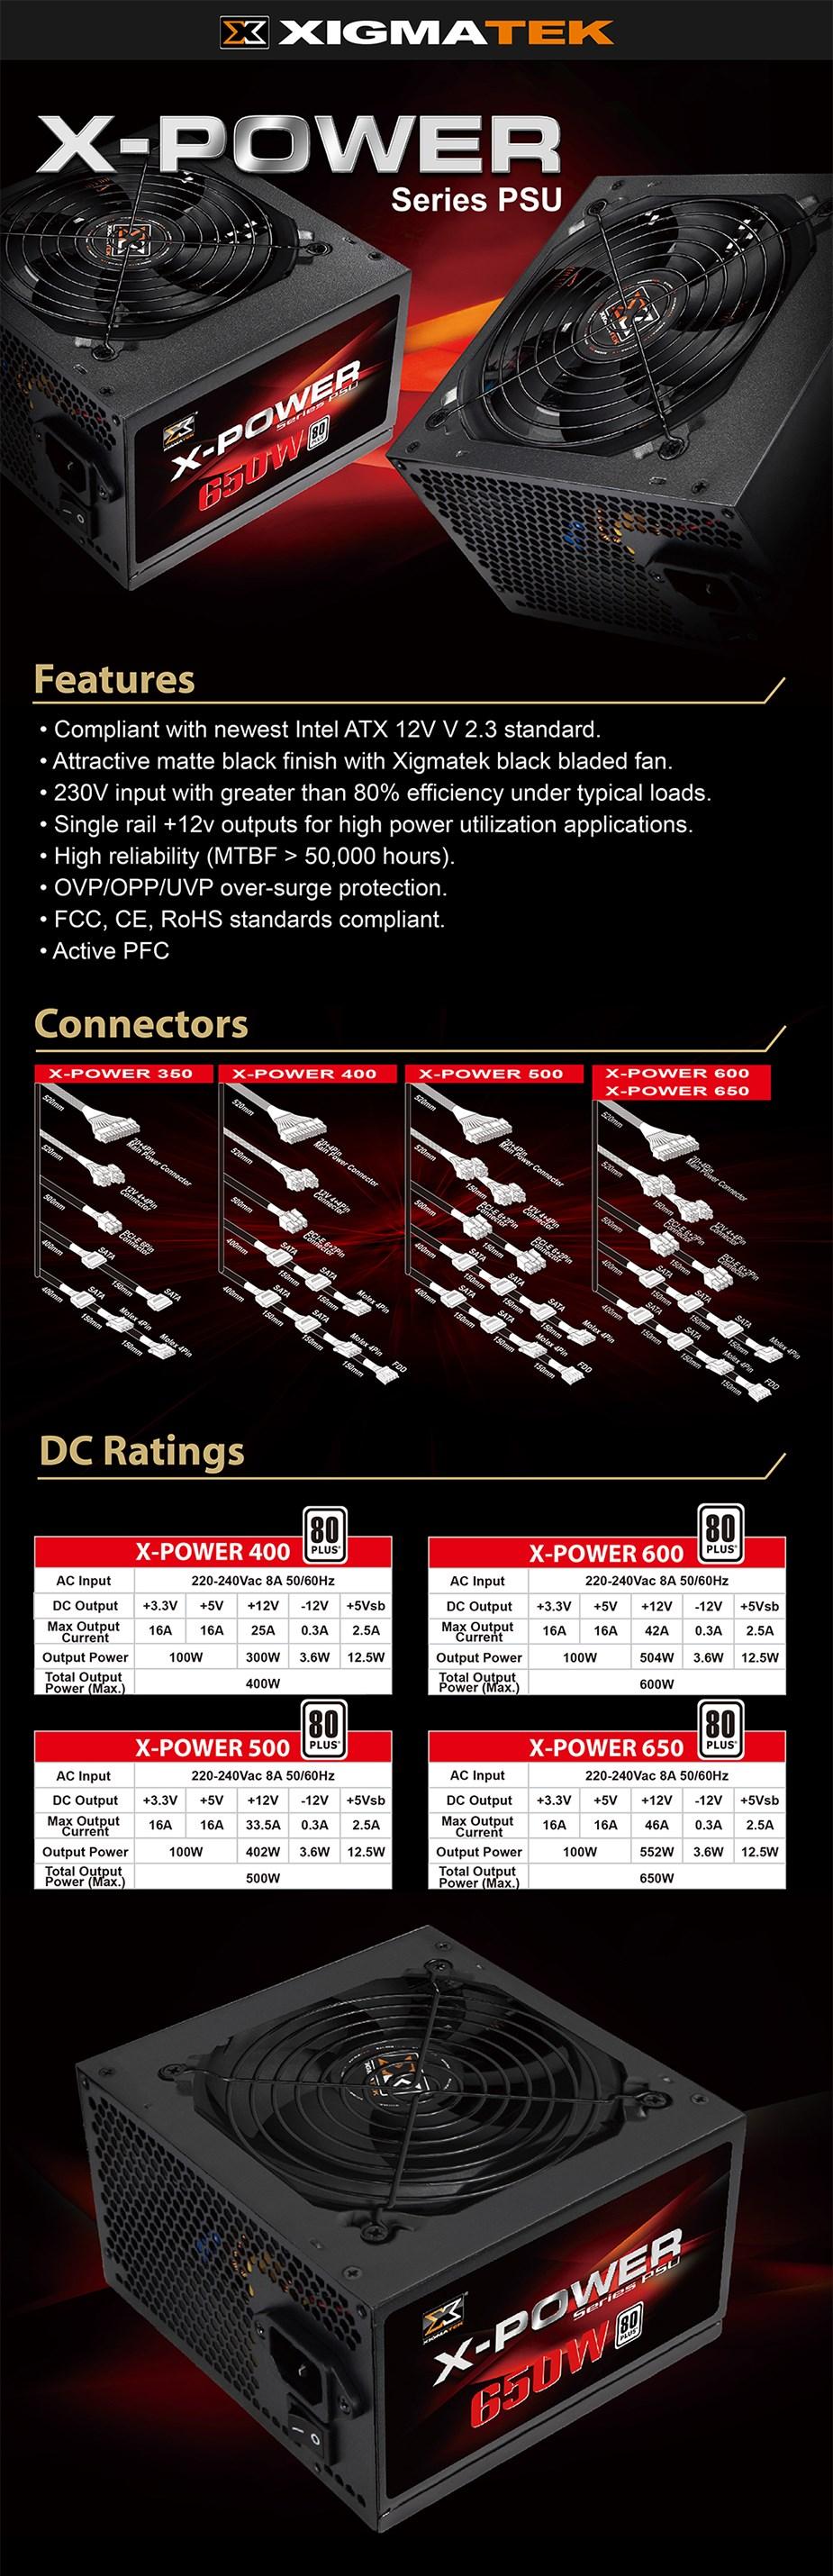 Xigmatek X-Power 500W 80+ Non-Modular Power Supply - Overview 1